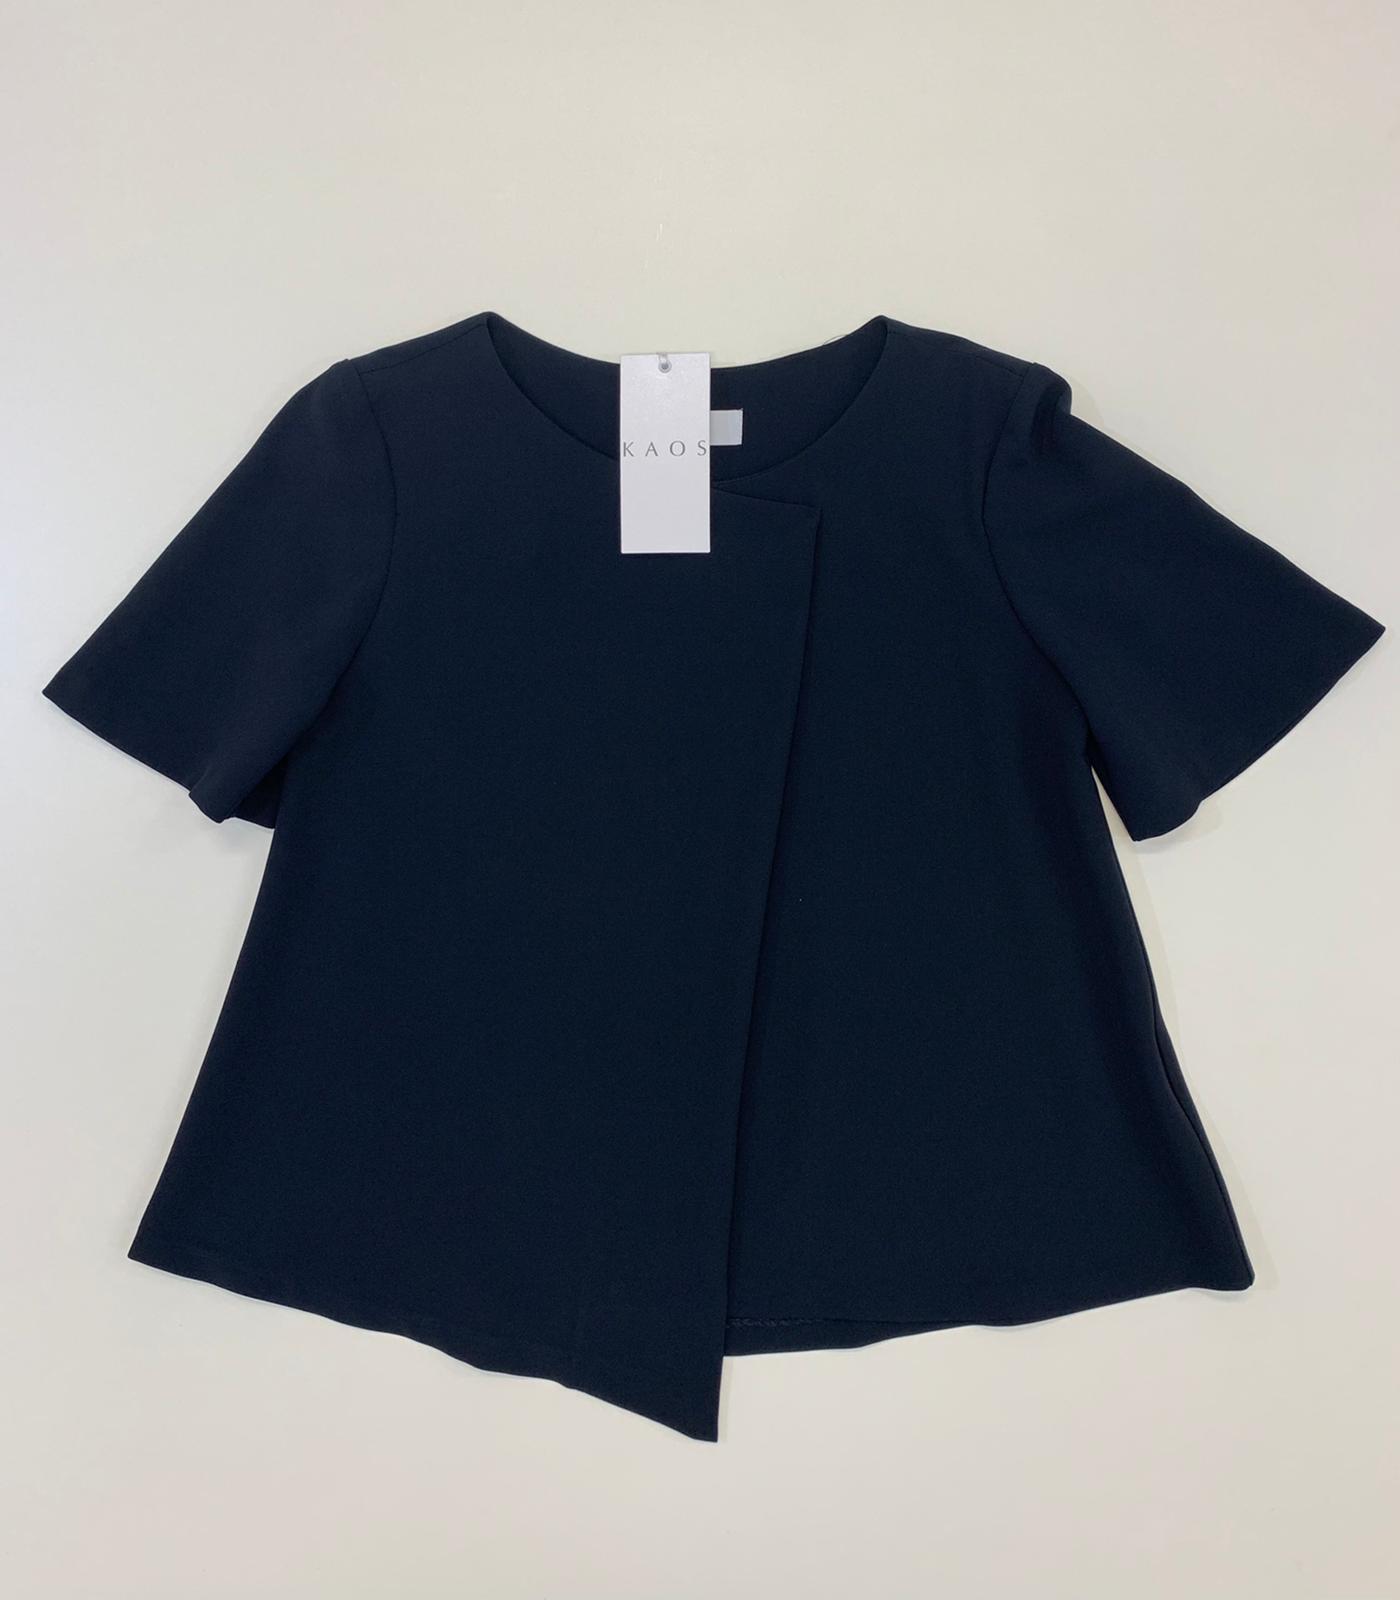 Blusa Donna Kaos Collection Blu